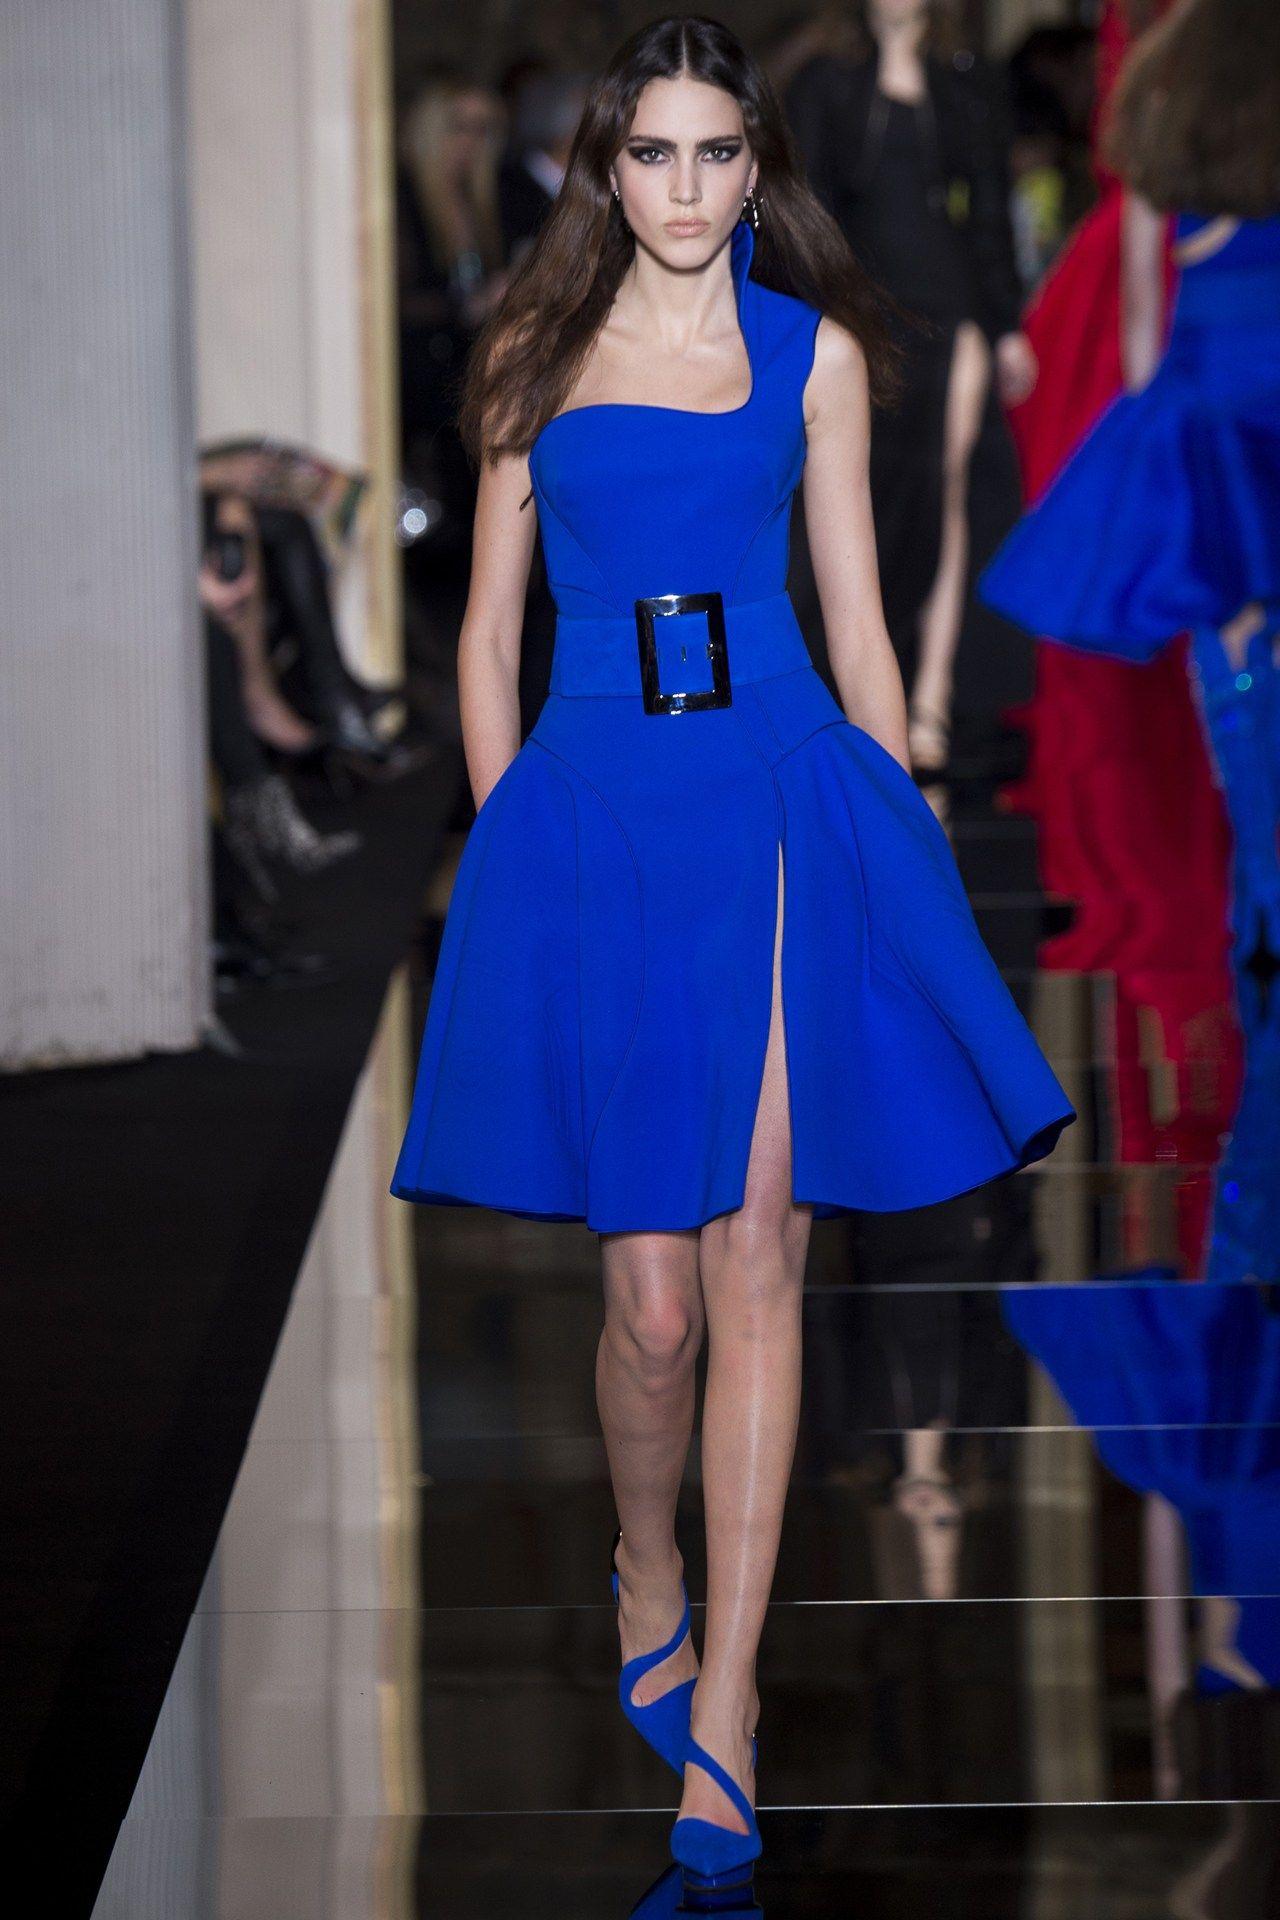 http://juliapetit.com.br/moda/versace-copia-modelo-de-vestido-de-stella-mccartney